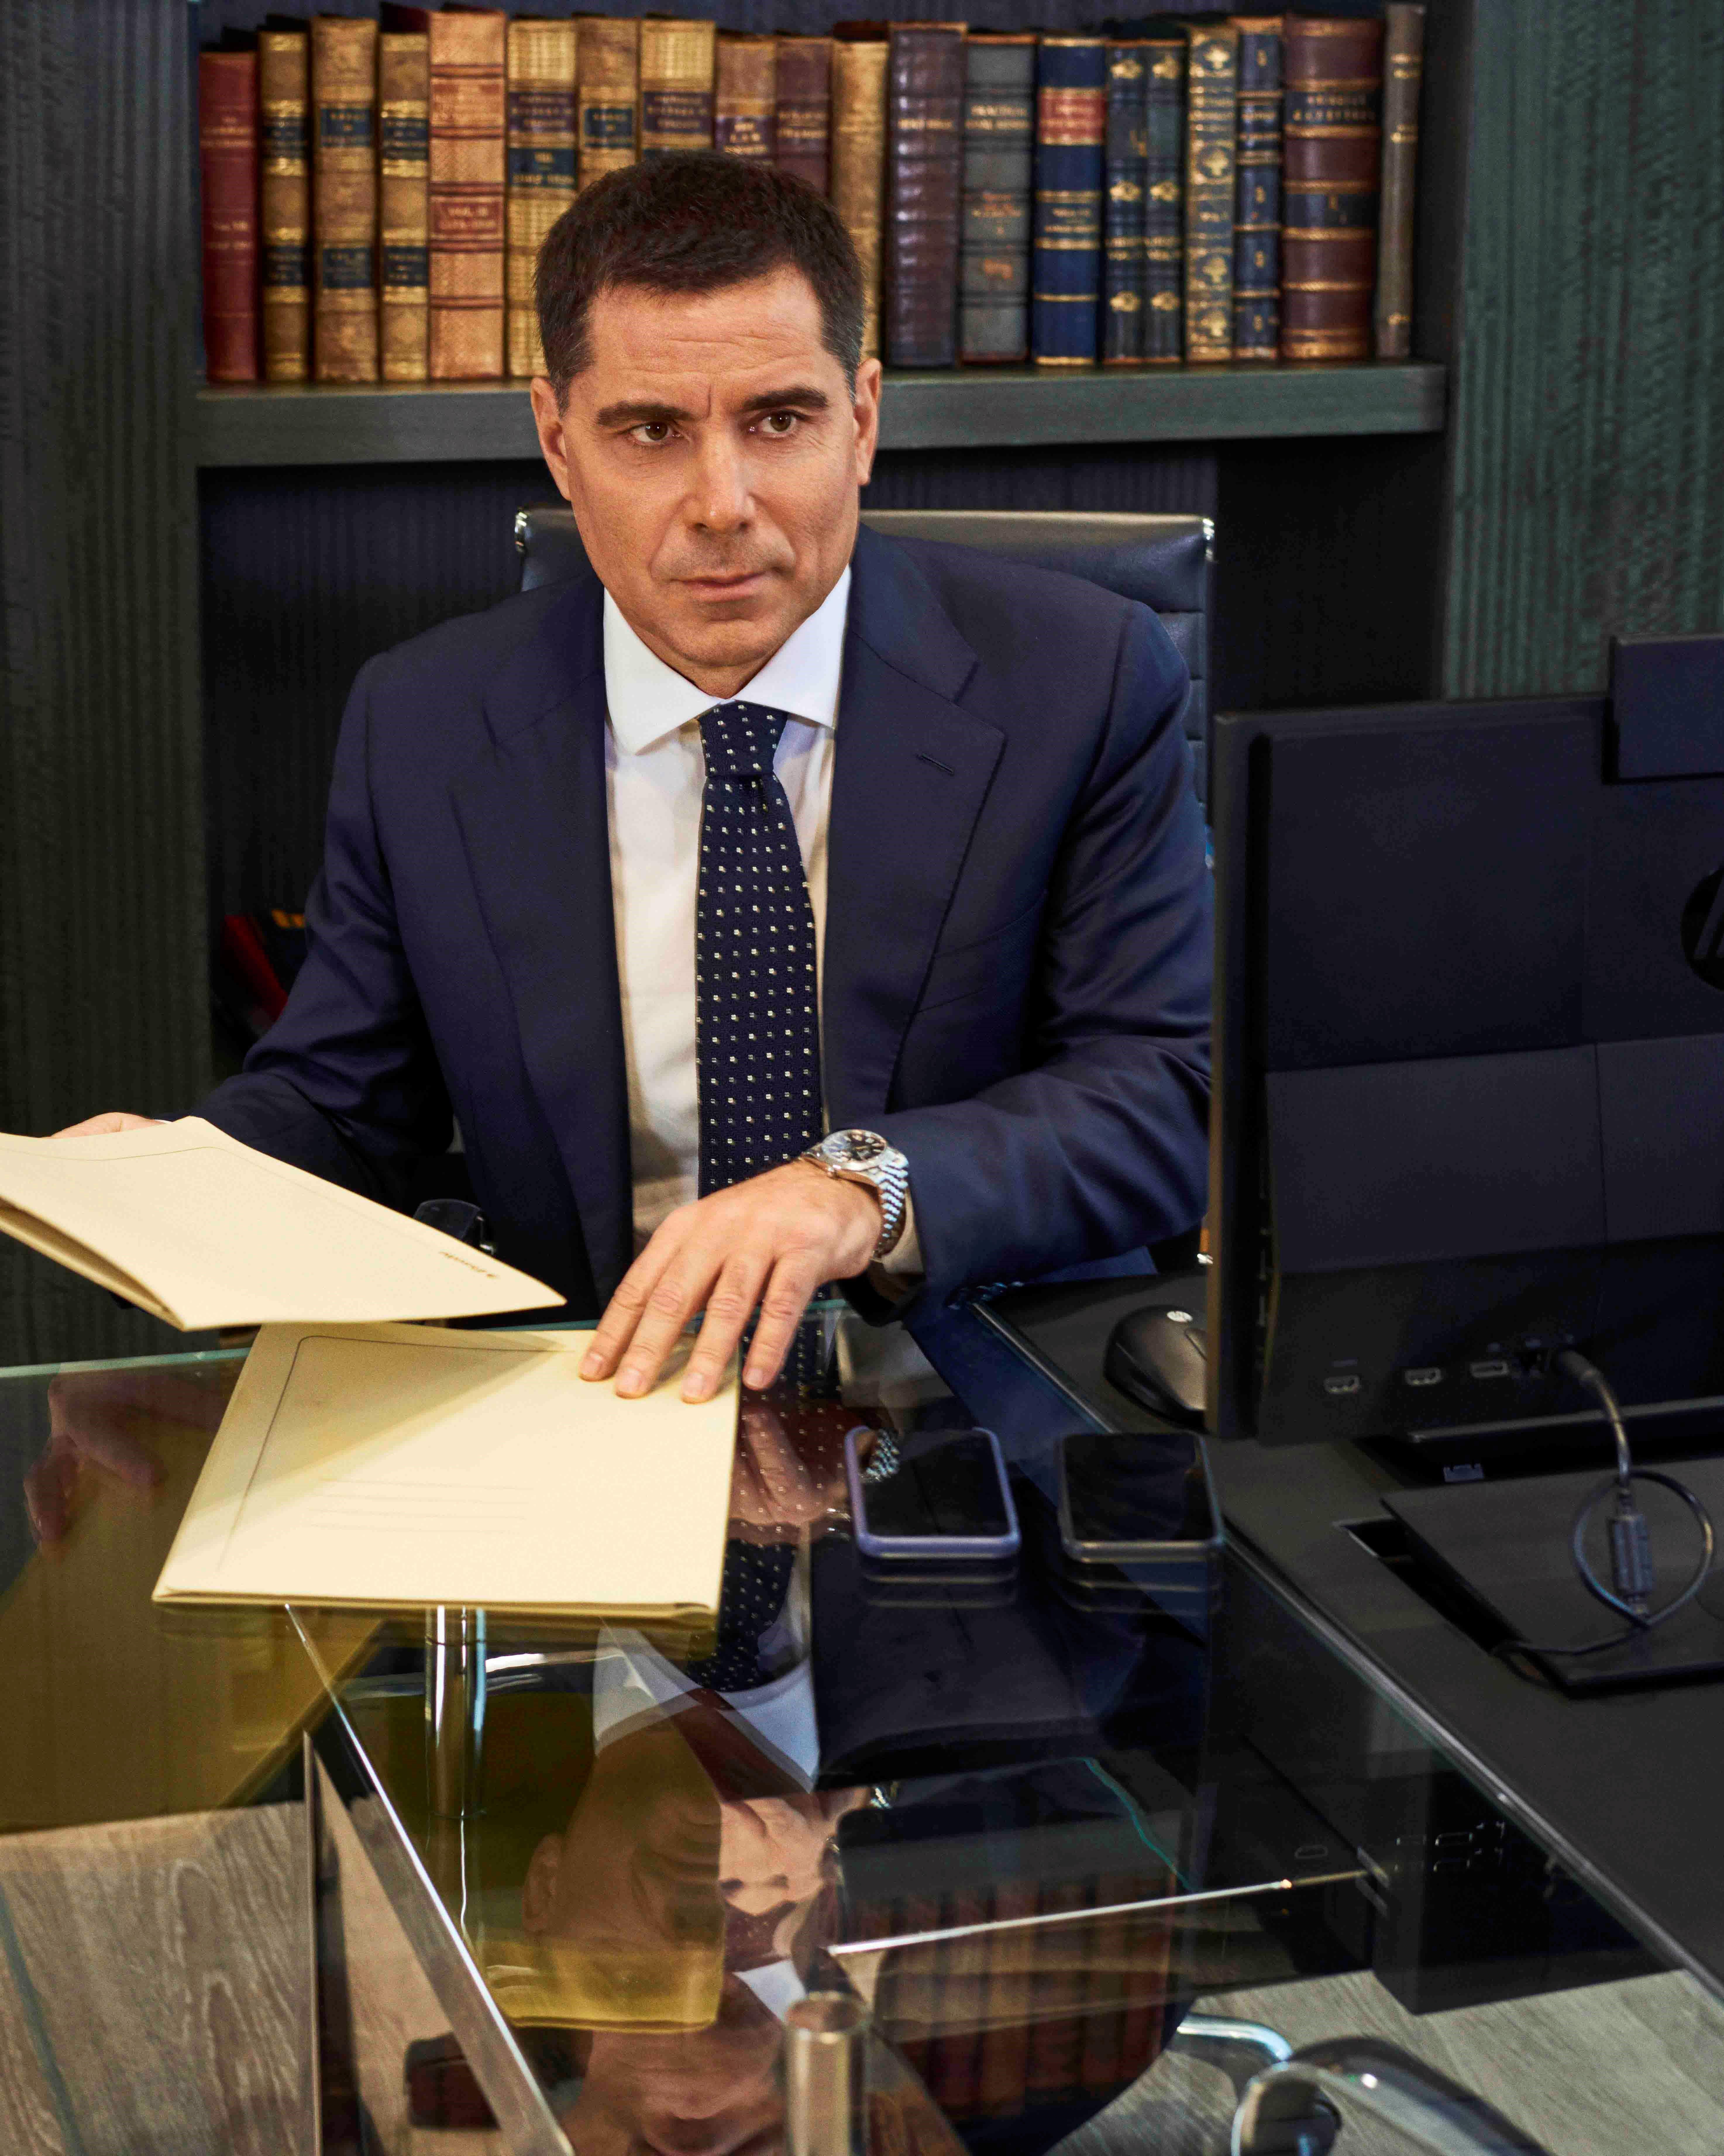 Riccardo Silva at the Silva International London office